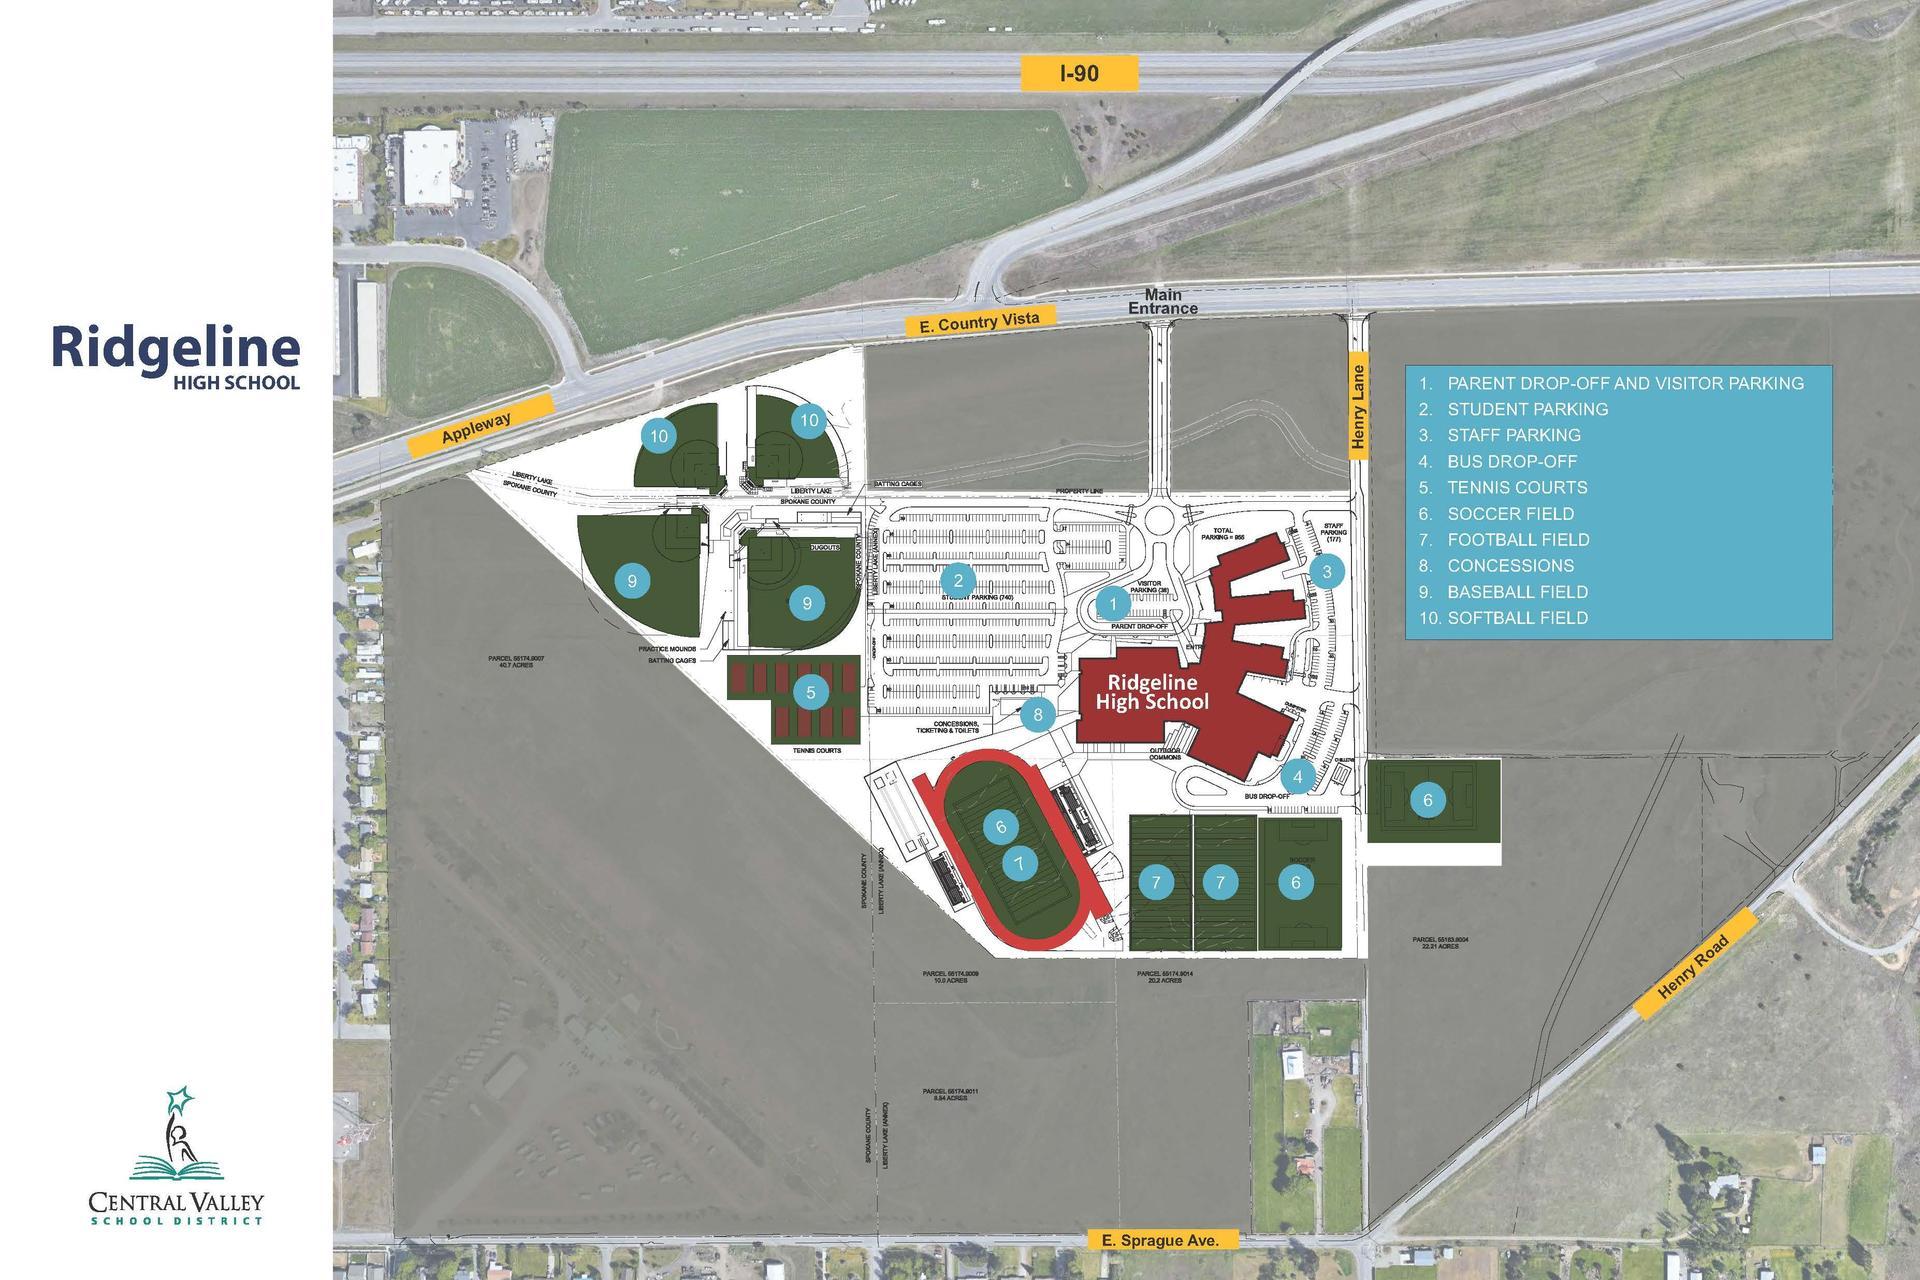 RHS siteplan